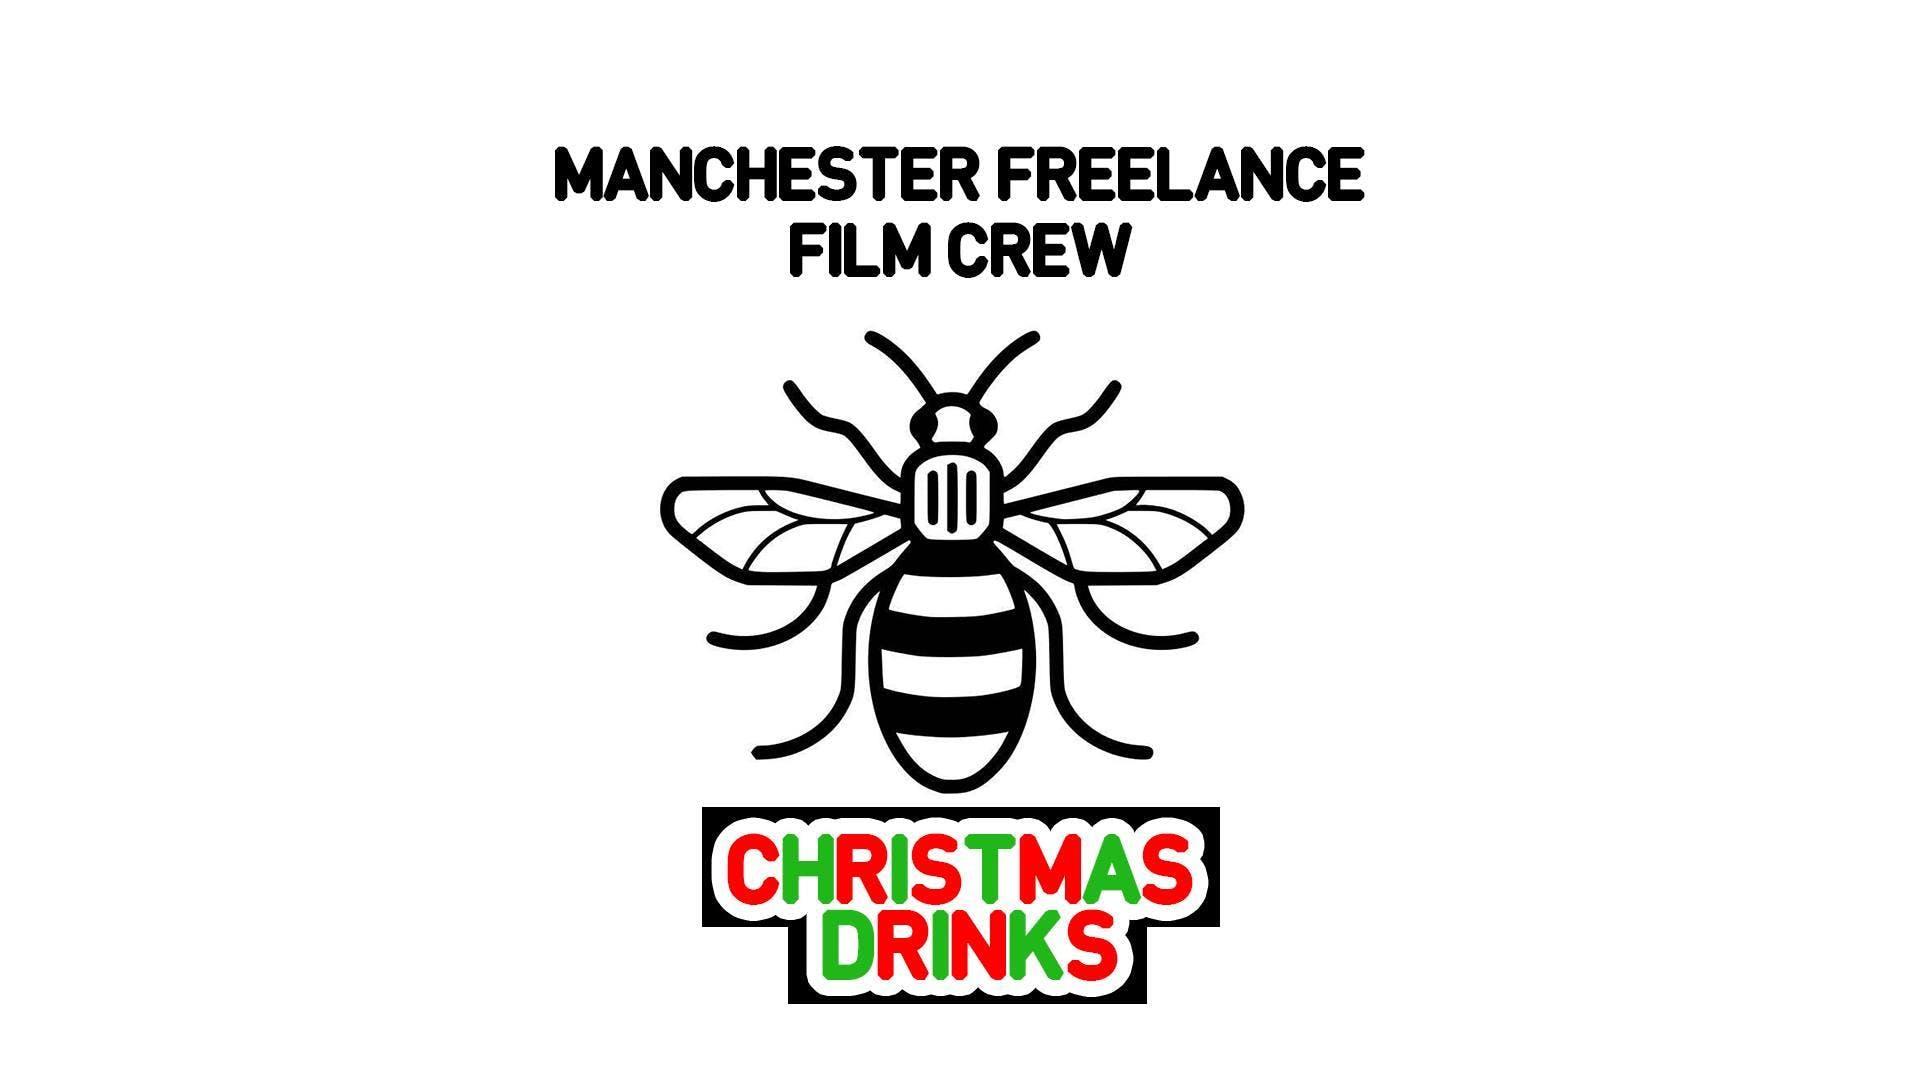 Manchester Freelance Film Crew - Christmas Dr